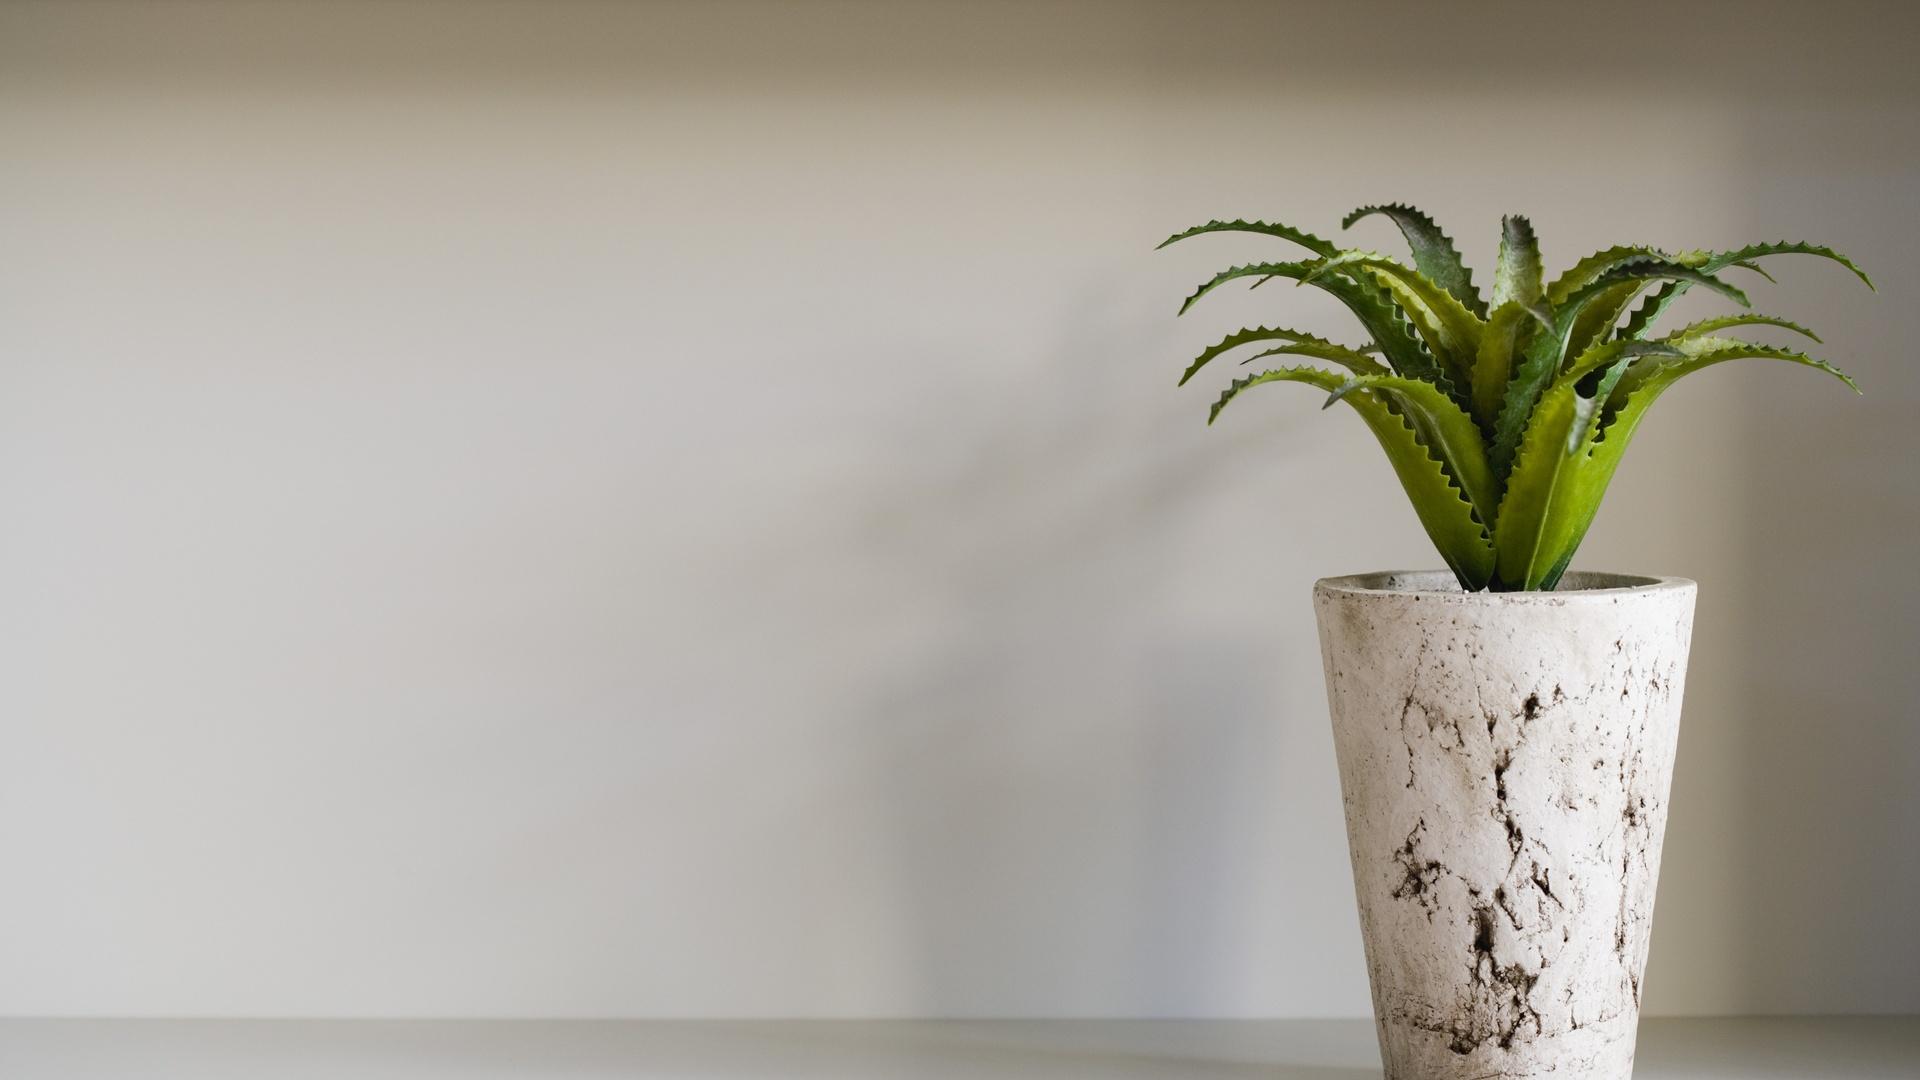 Houseplants free pic